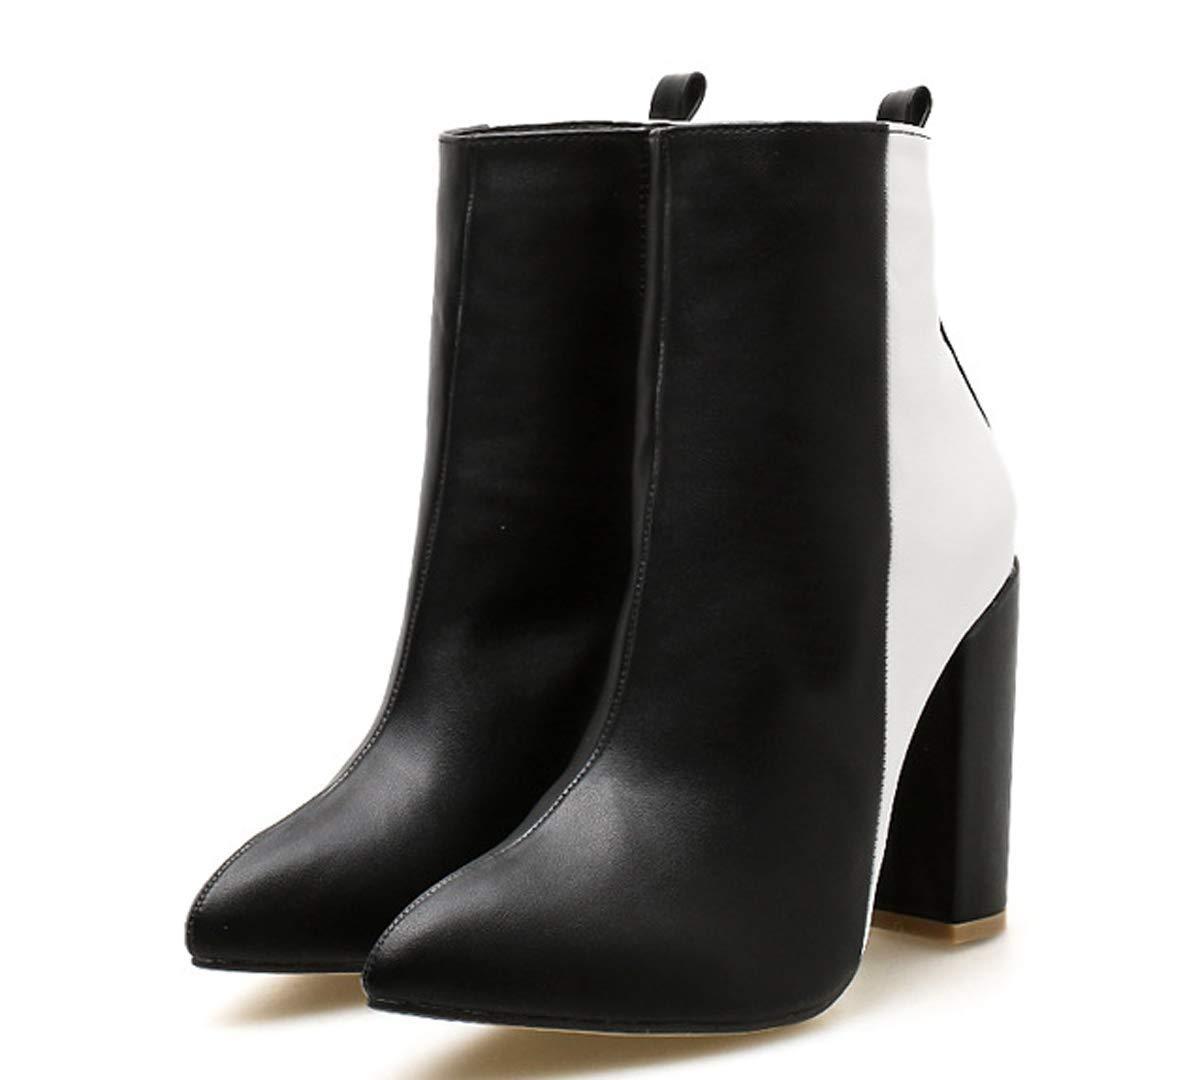 HBDLH Damenschuhe Mode Kurze Stiefel High 11Cm Wirkung Das Raue Spitze Nackt - Stiefel.